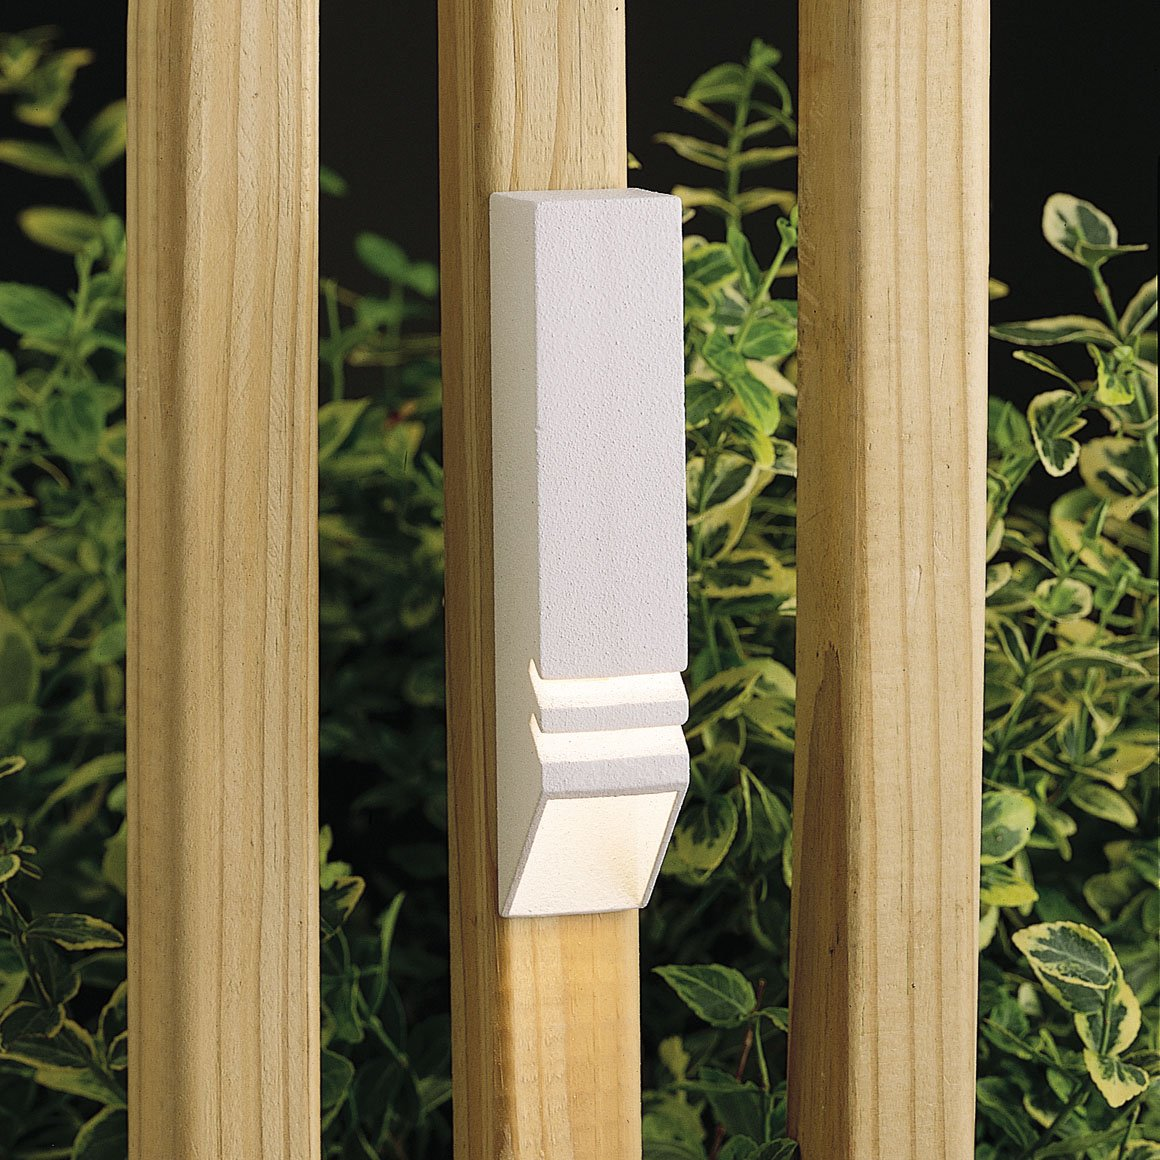 Kichler 15066WHT One Light Deck Rail